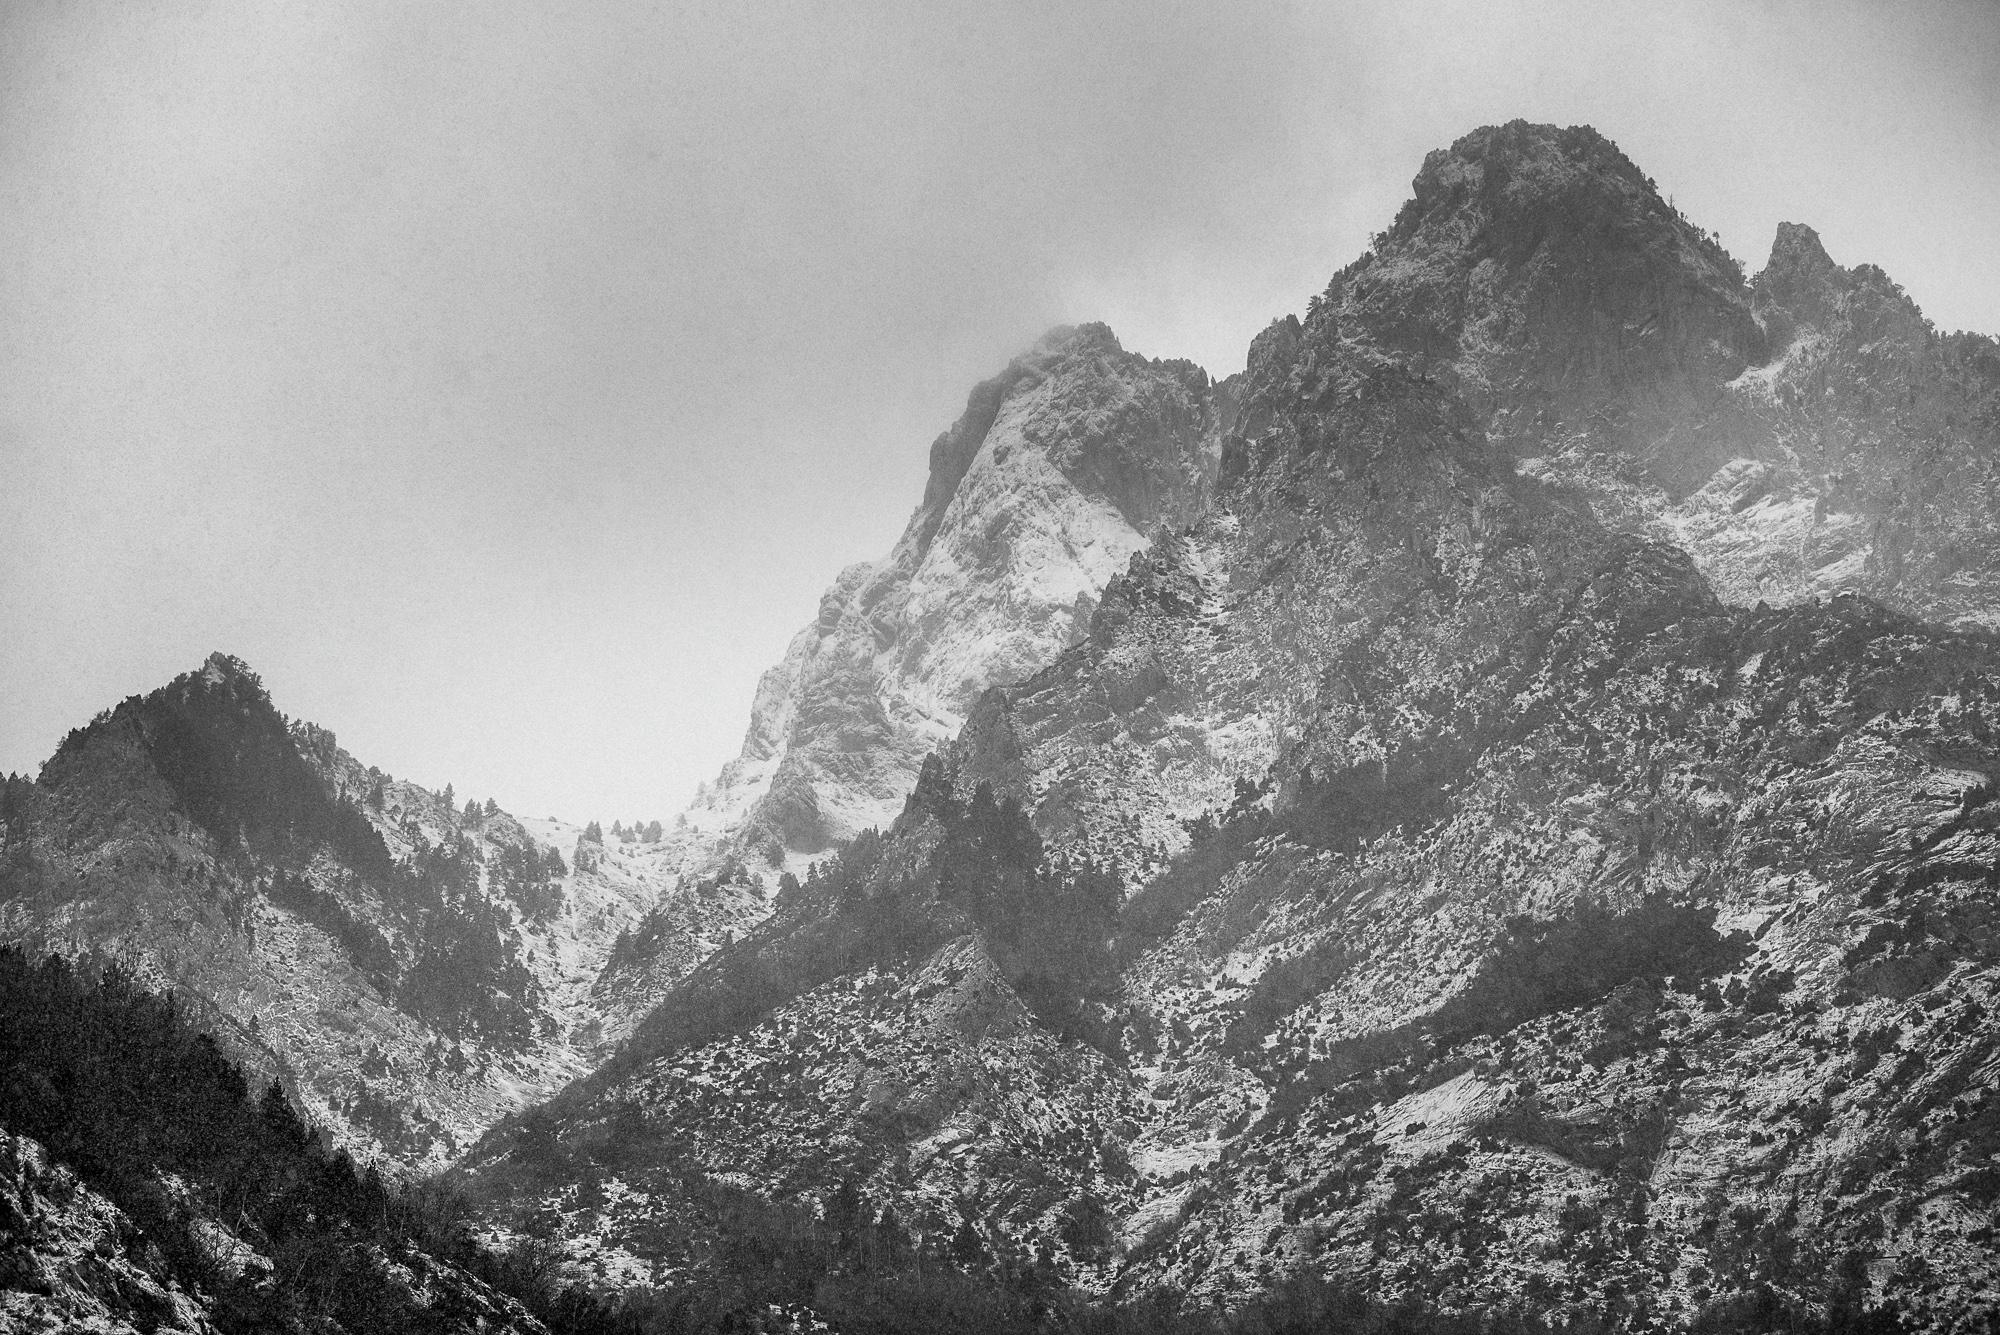 Pirineos_FedeGrau_Fotografo_05.jpg